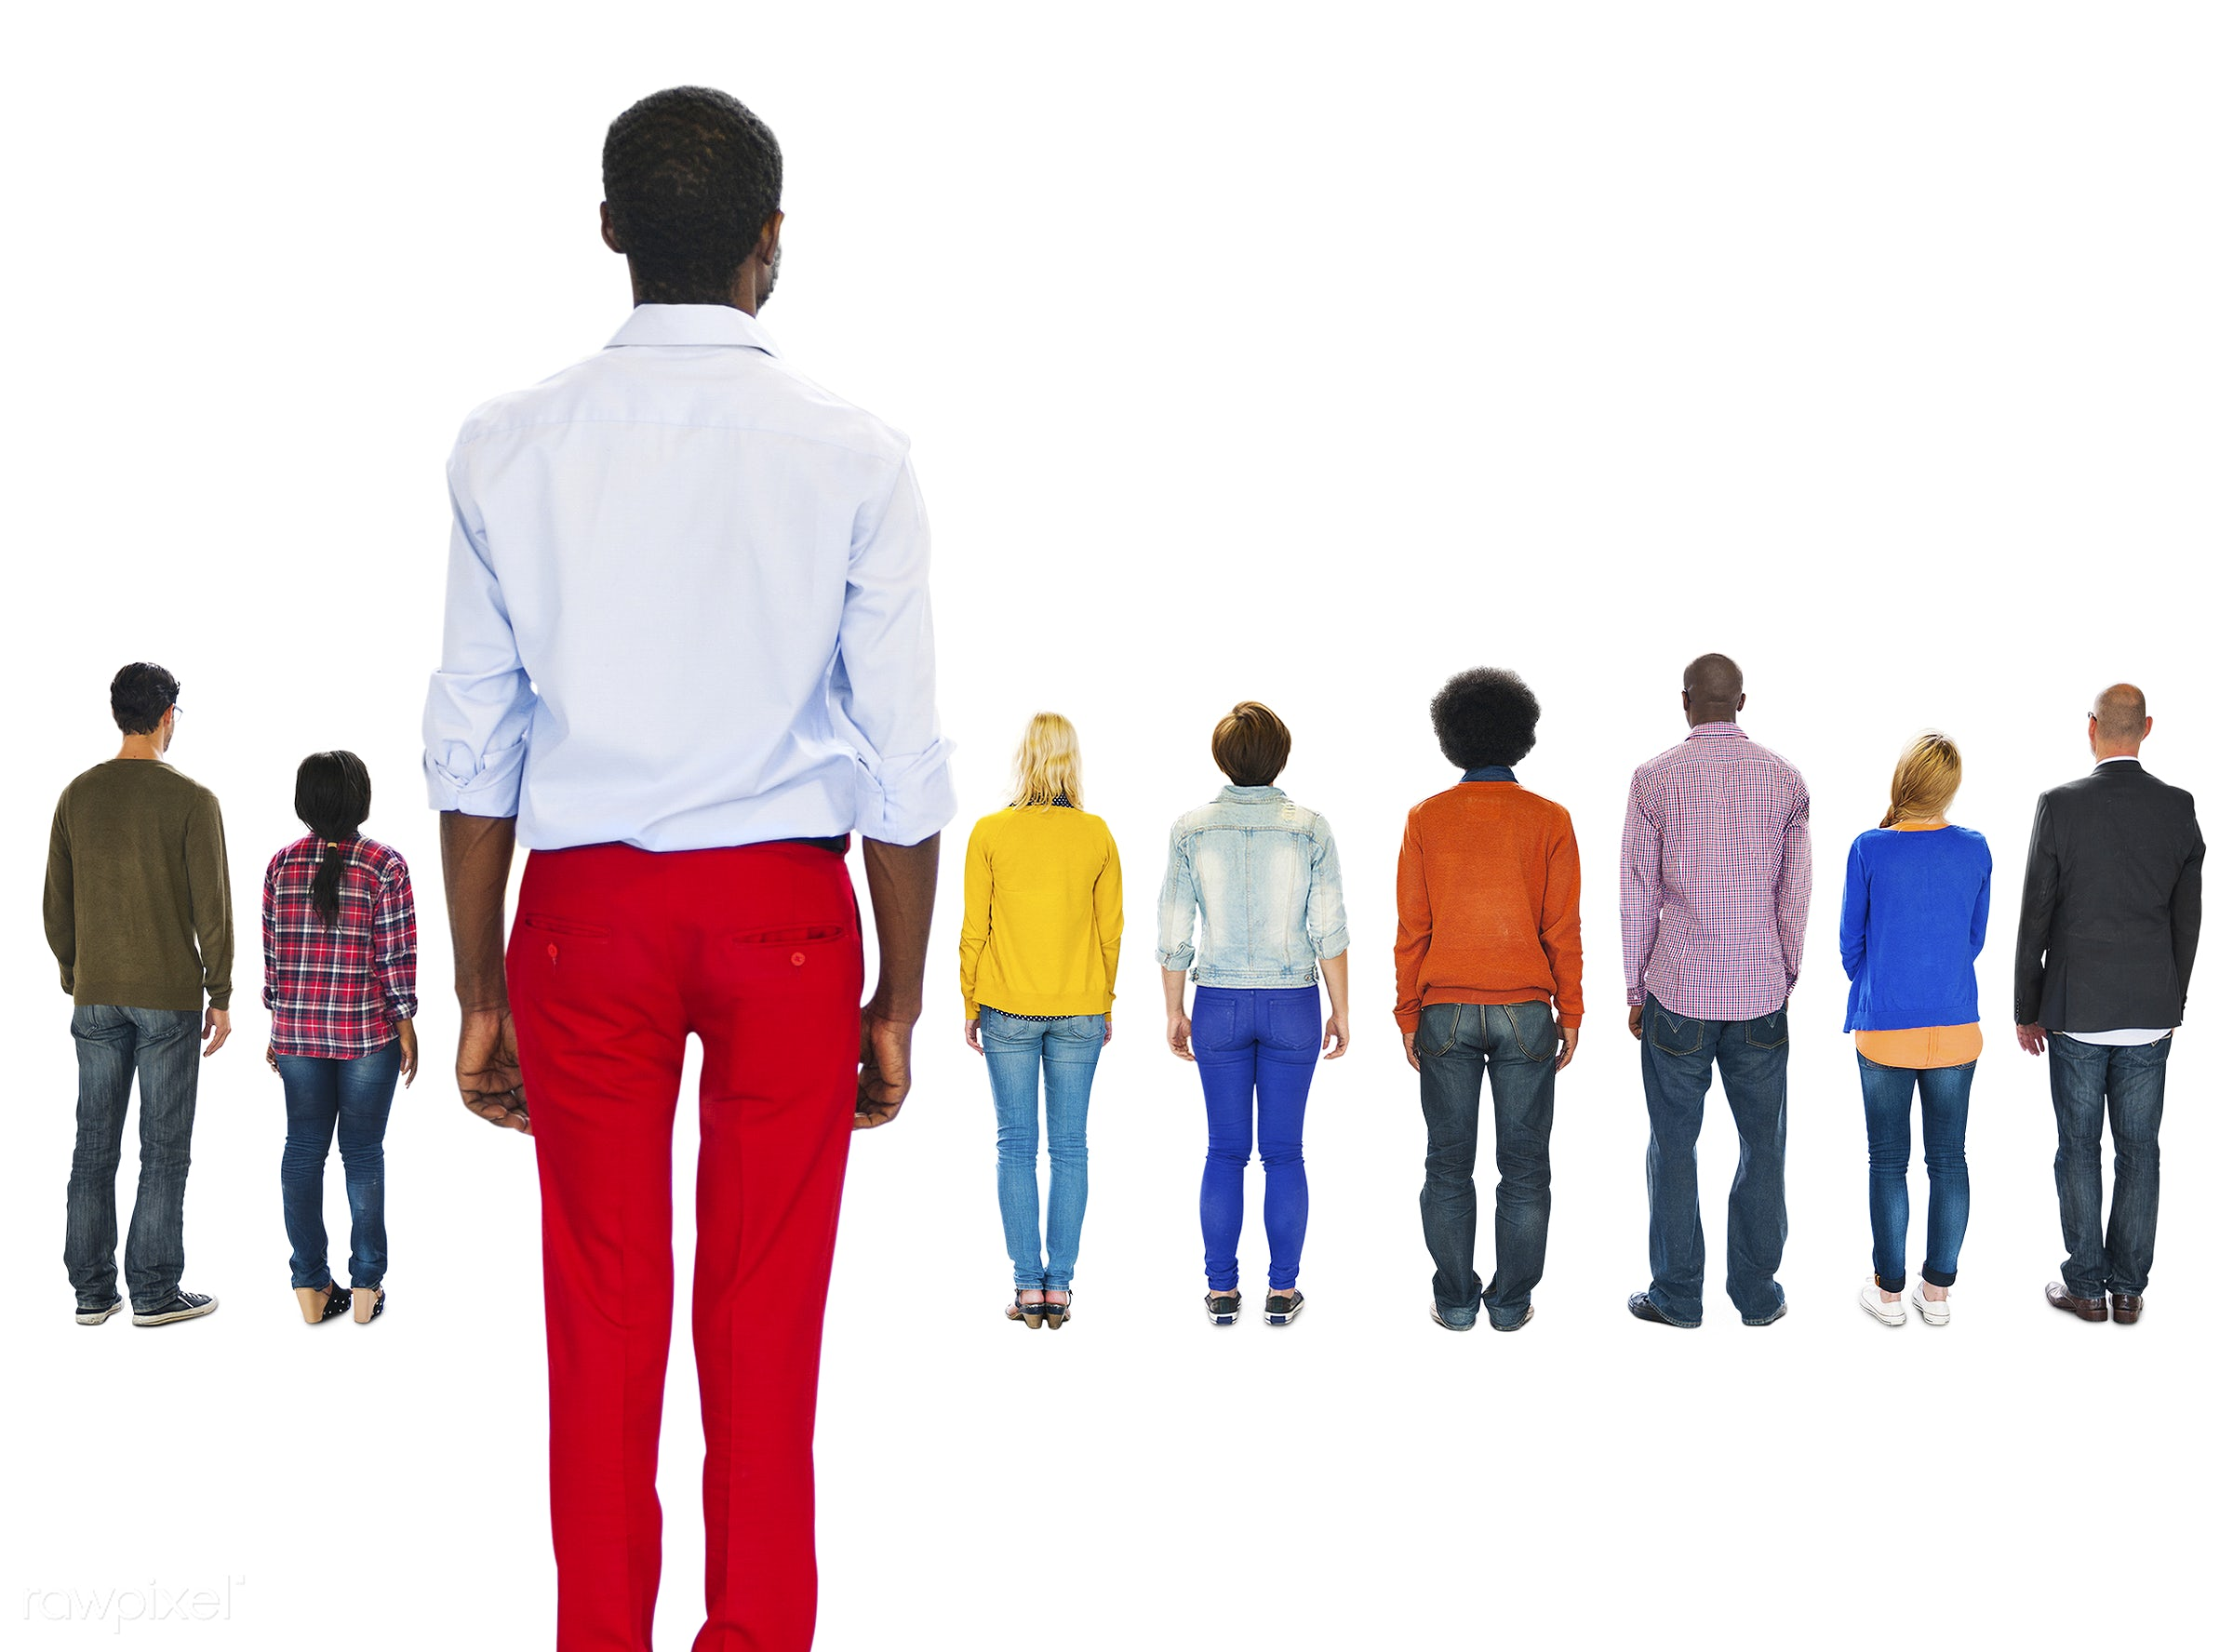 african, african american, african descent, african ethnicity, alone, anti-social, back, back view, black, blank, community...